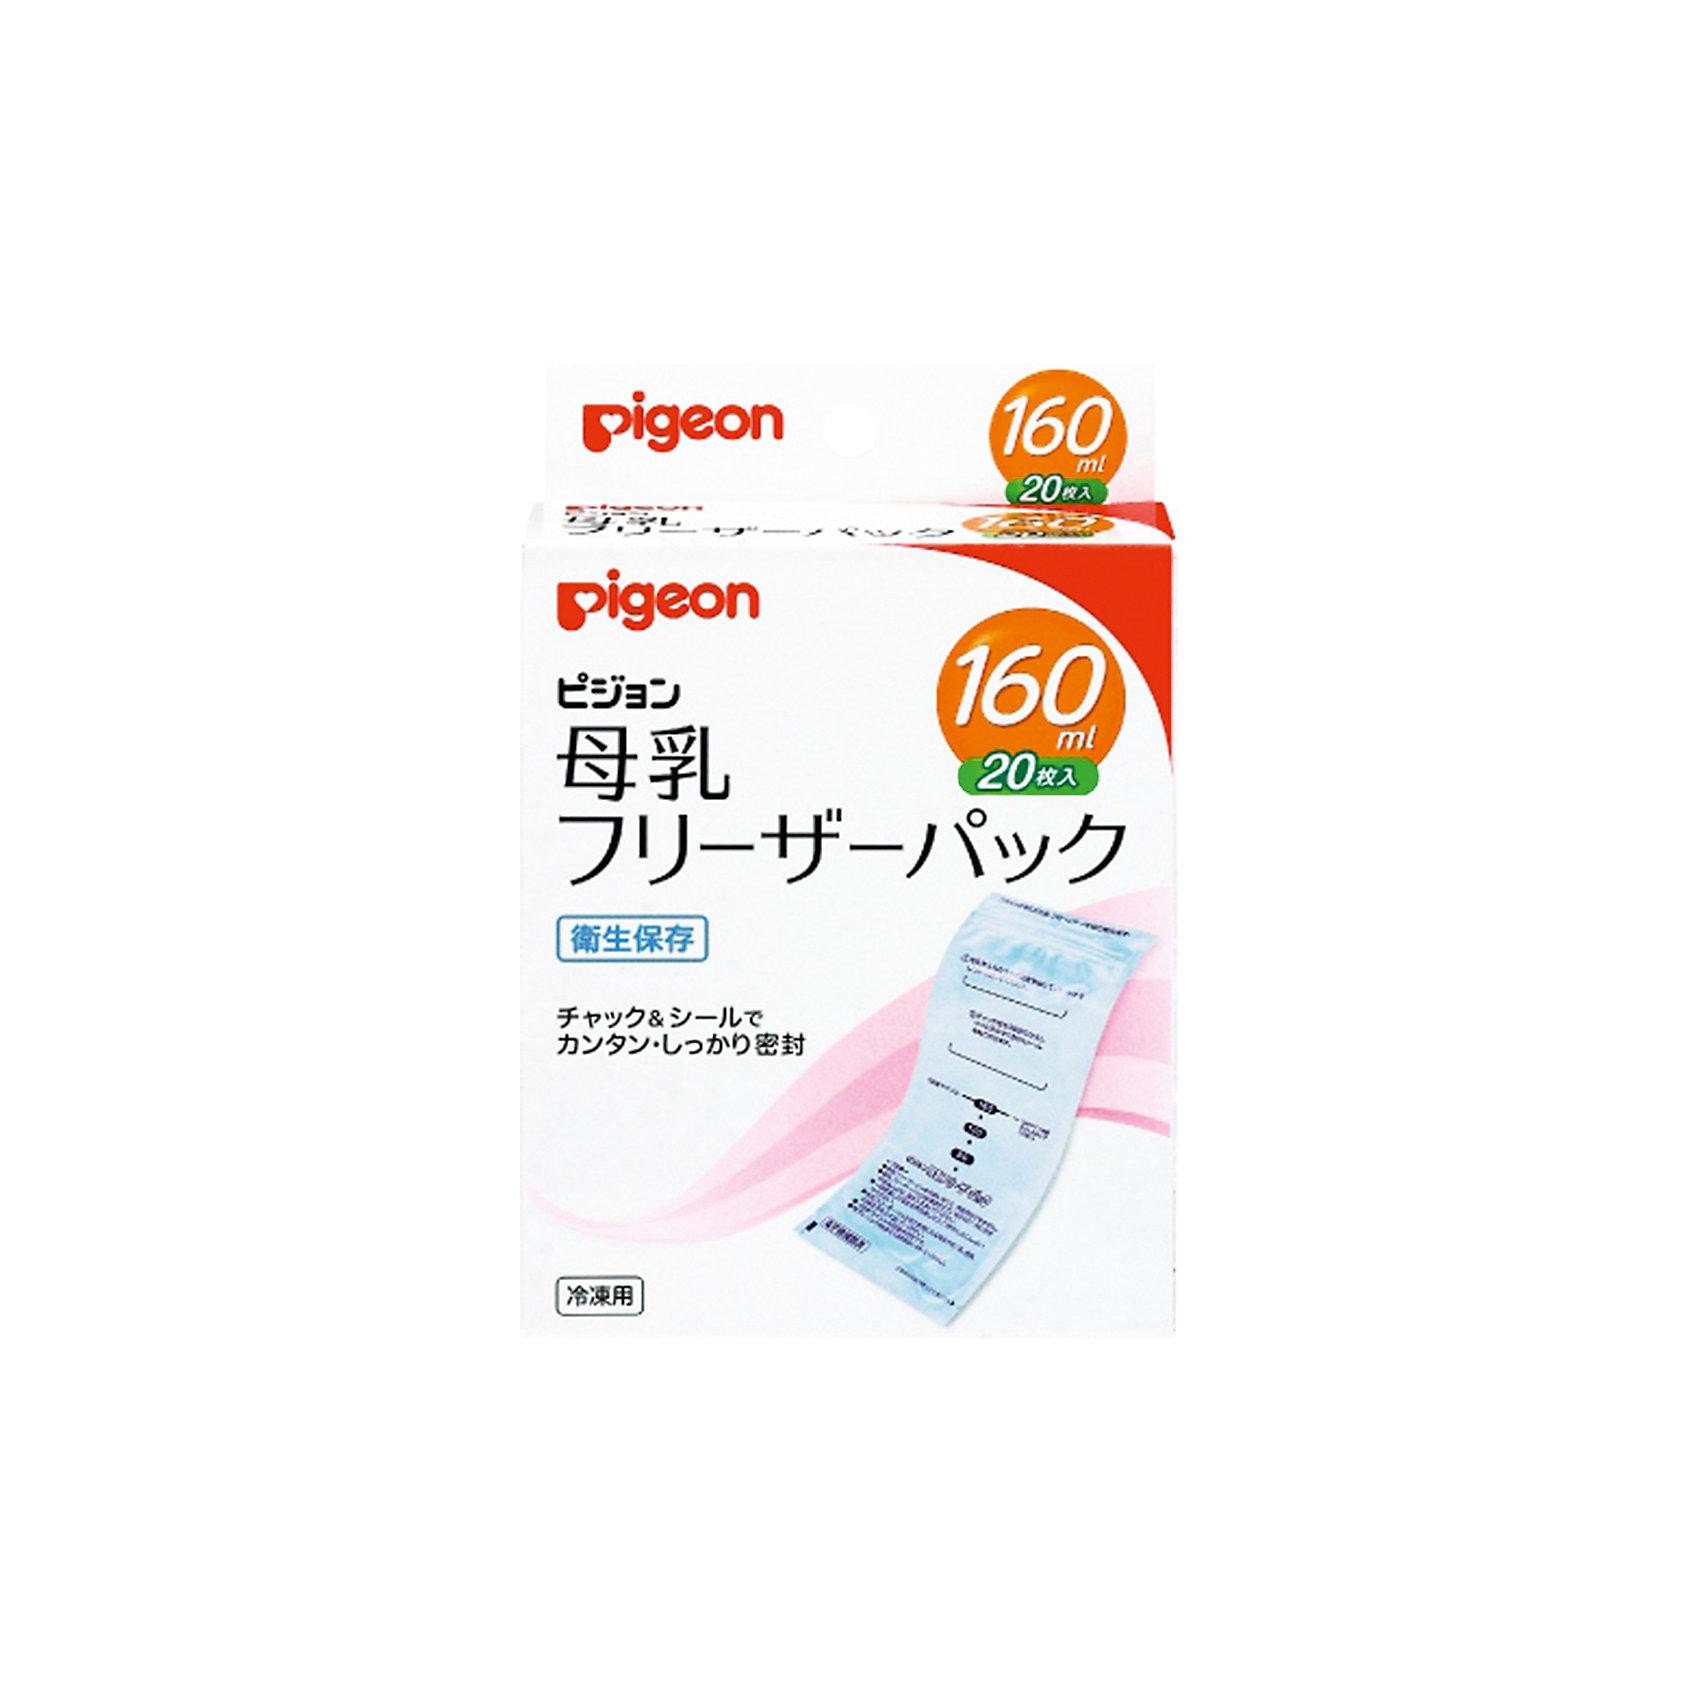 Пакет для заморозки грудного молока 160 мл, 20 шт., Pigeon